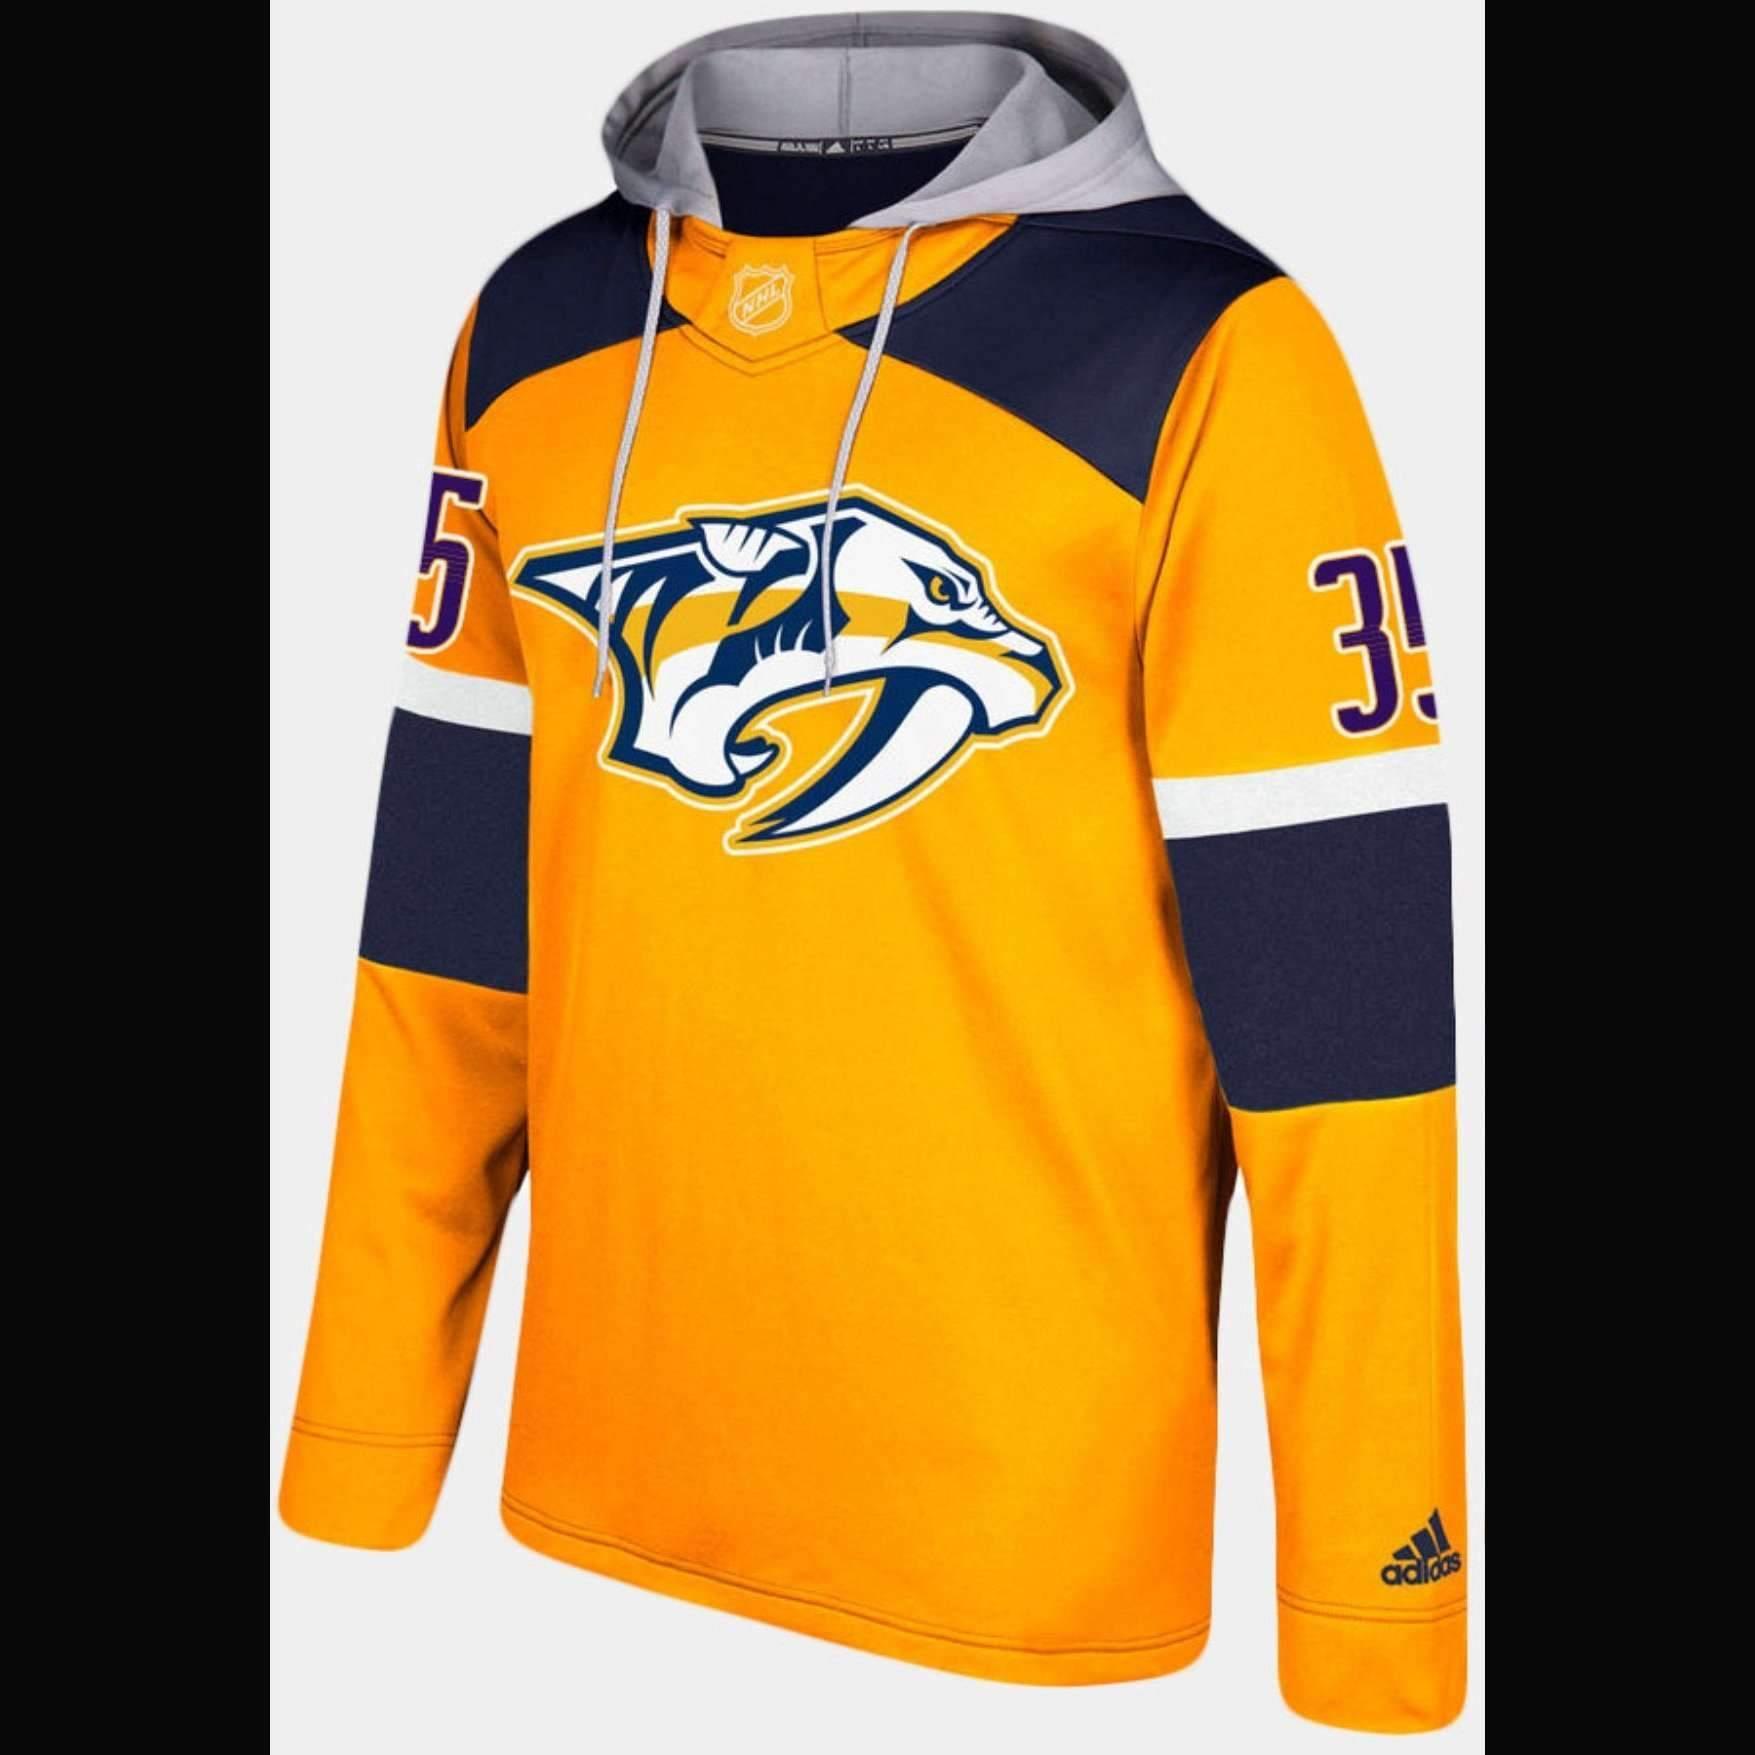 Nashville Predators Adidas NHL Hockey Jersey Style Hoodie